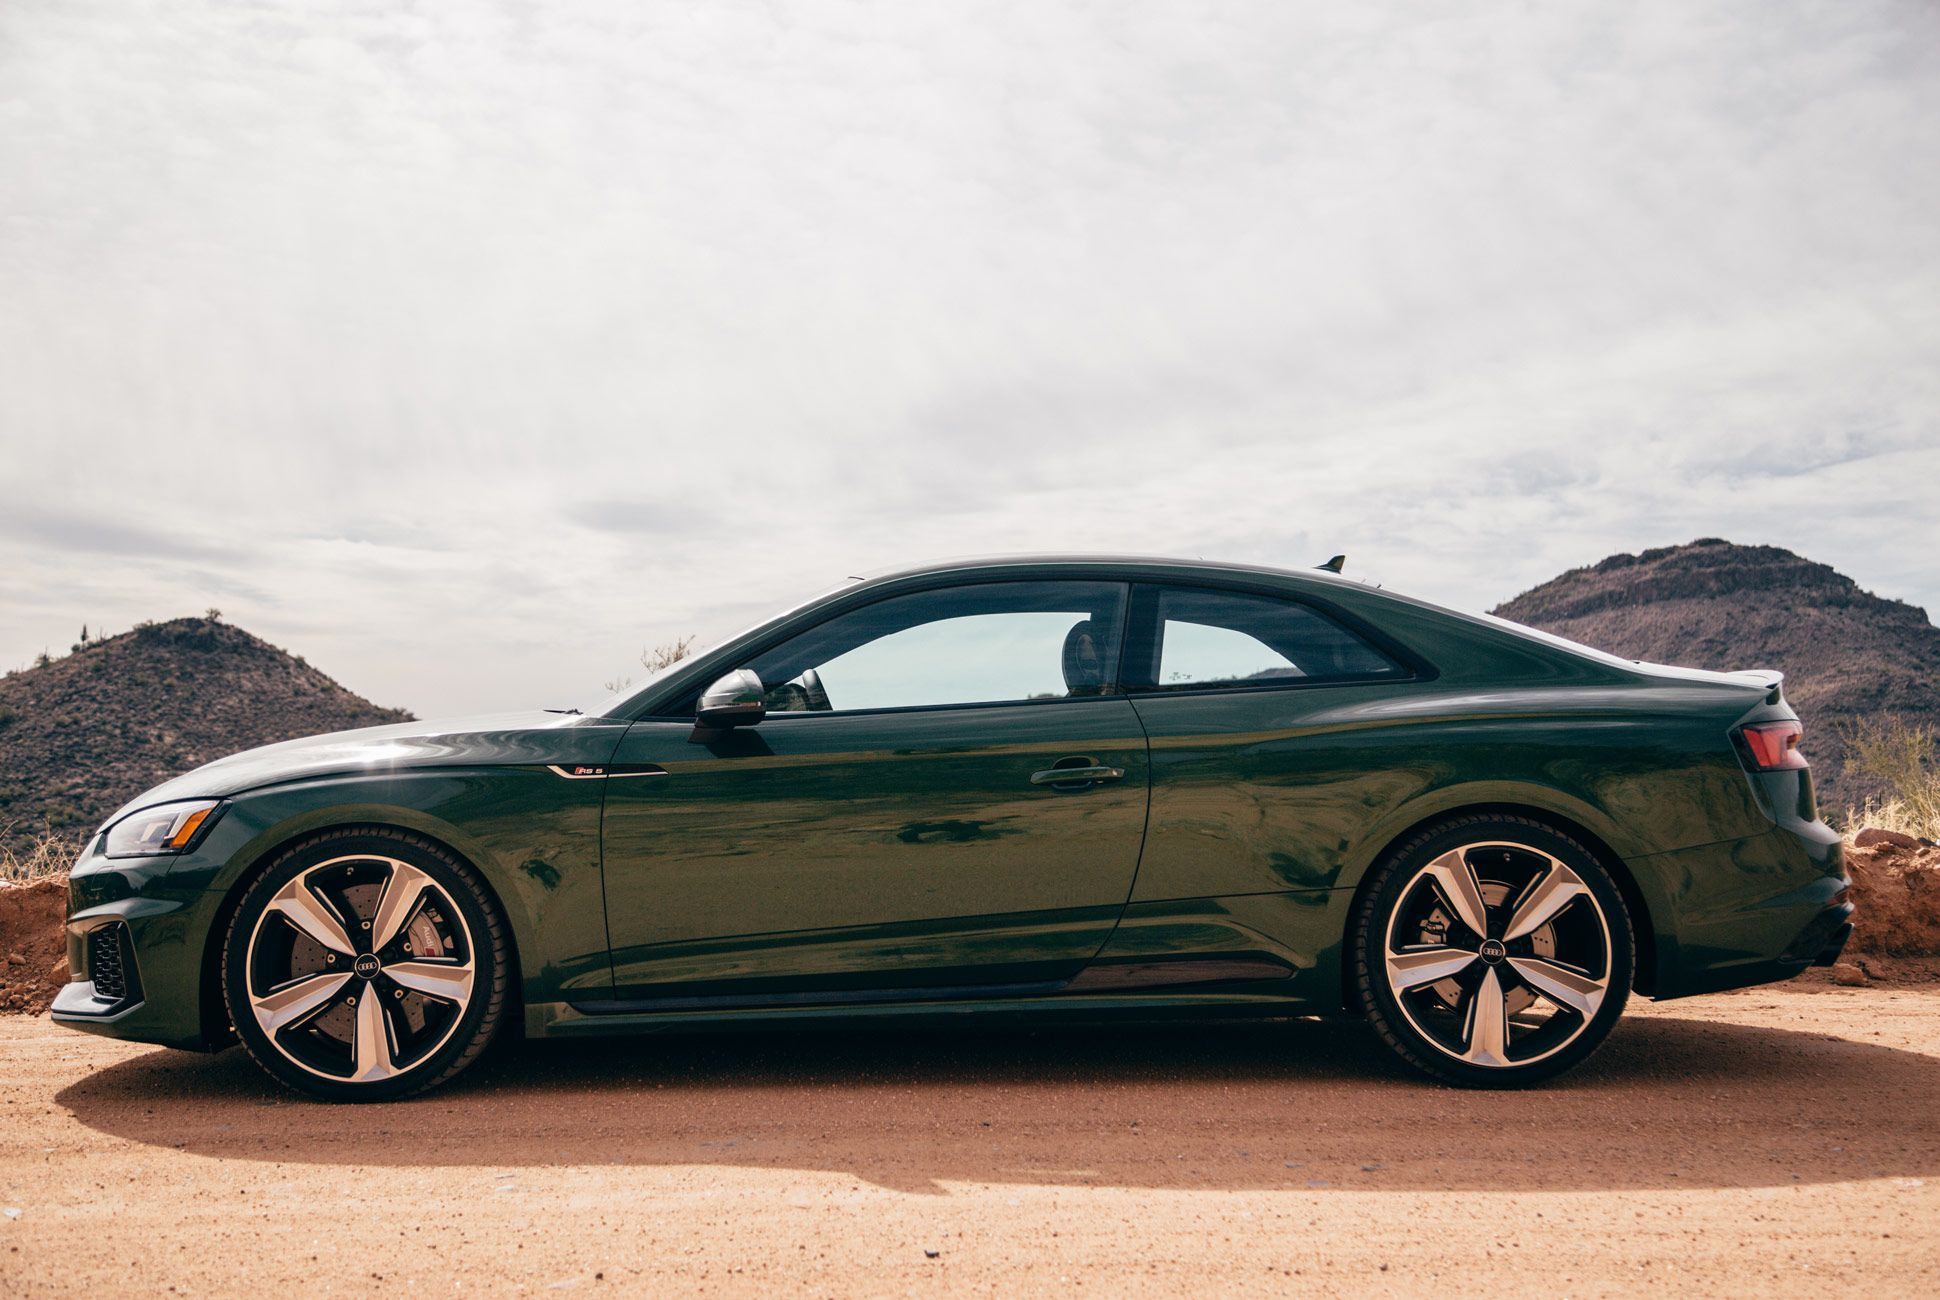 Audi-RS5-Gear-Patrol-Slide-3